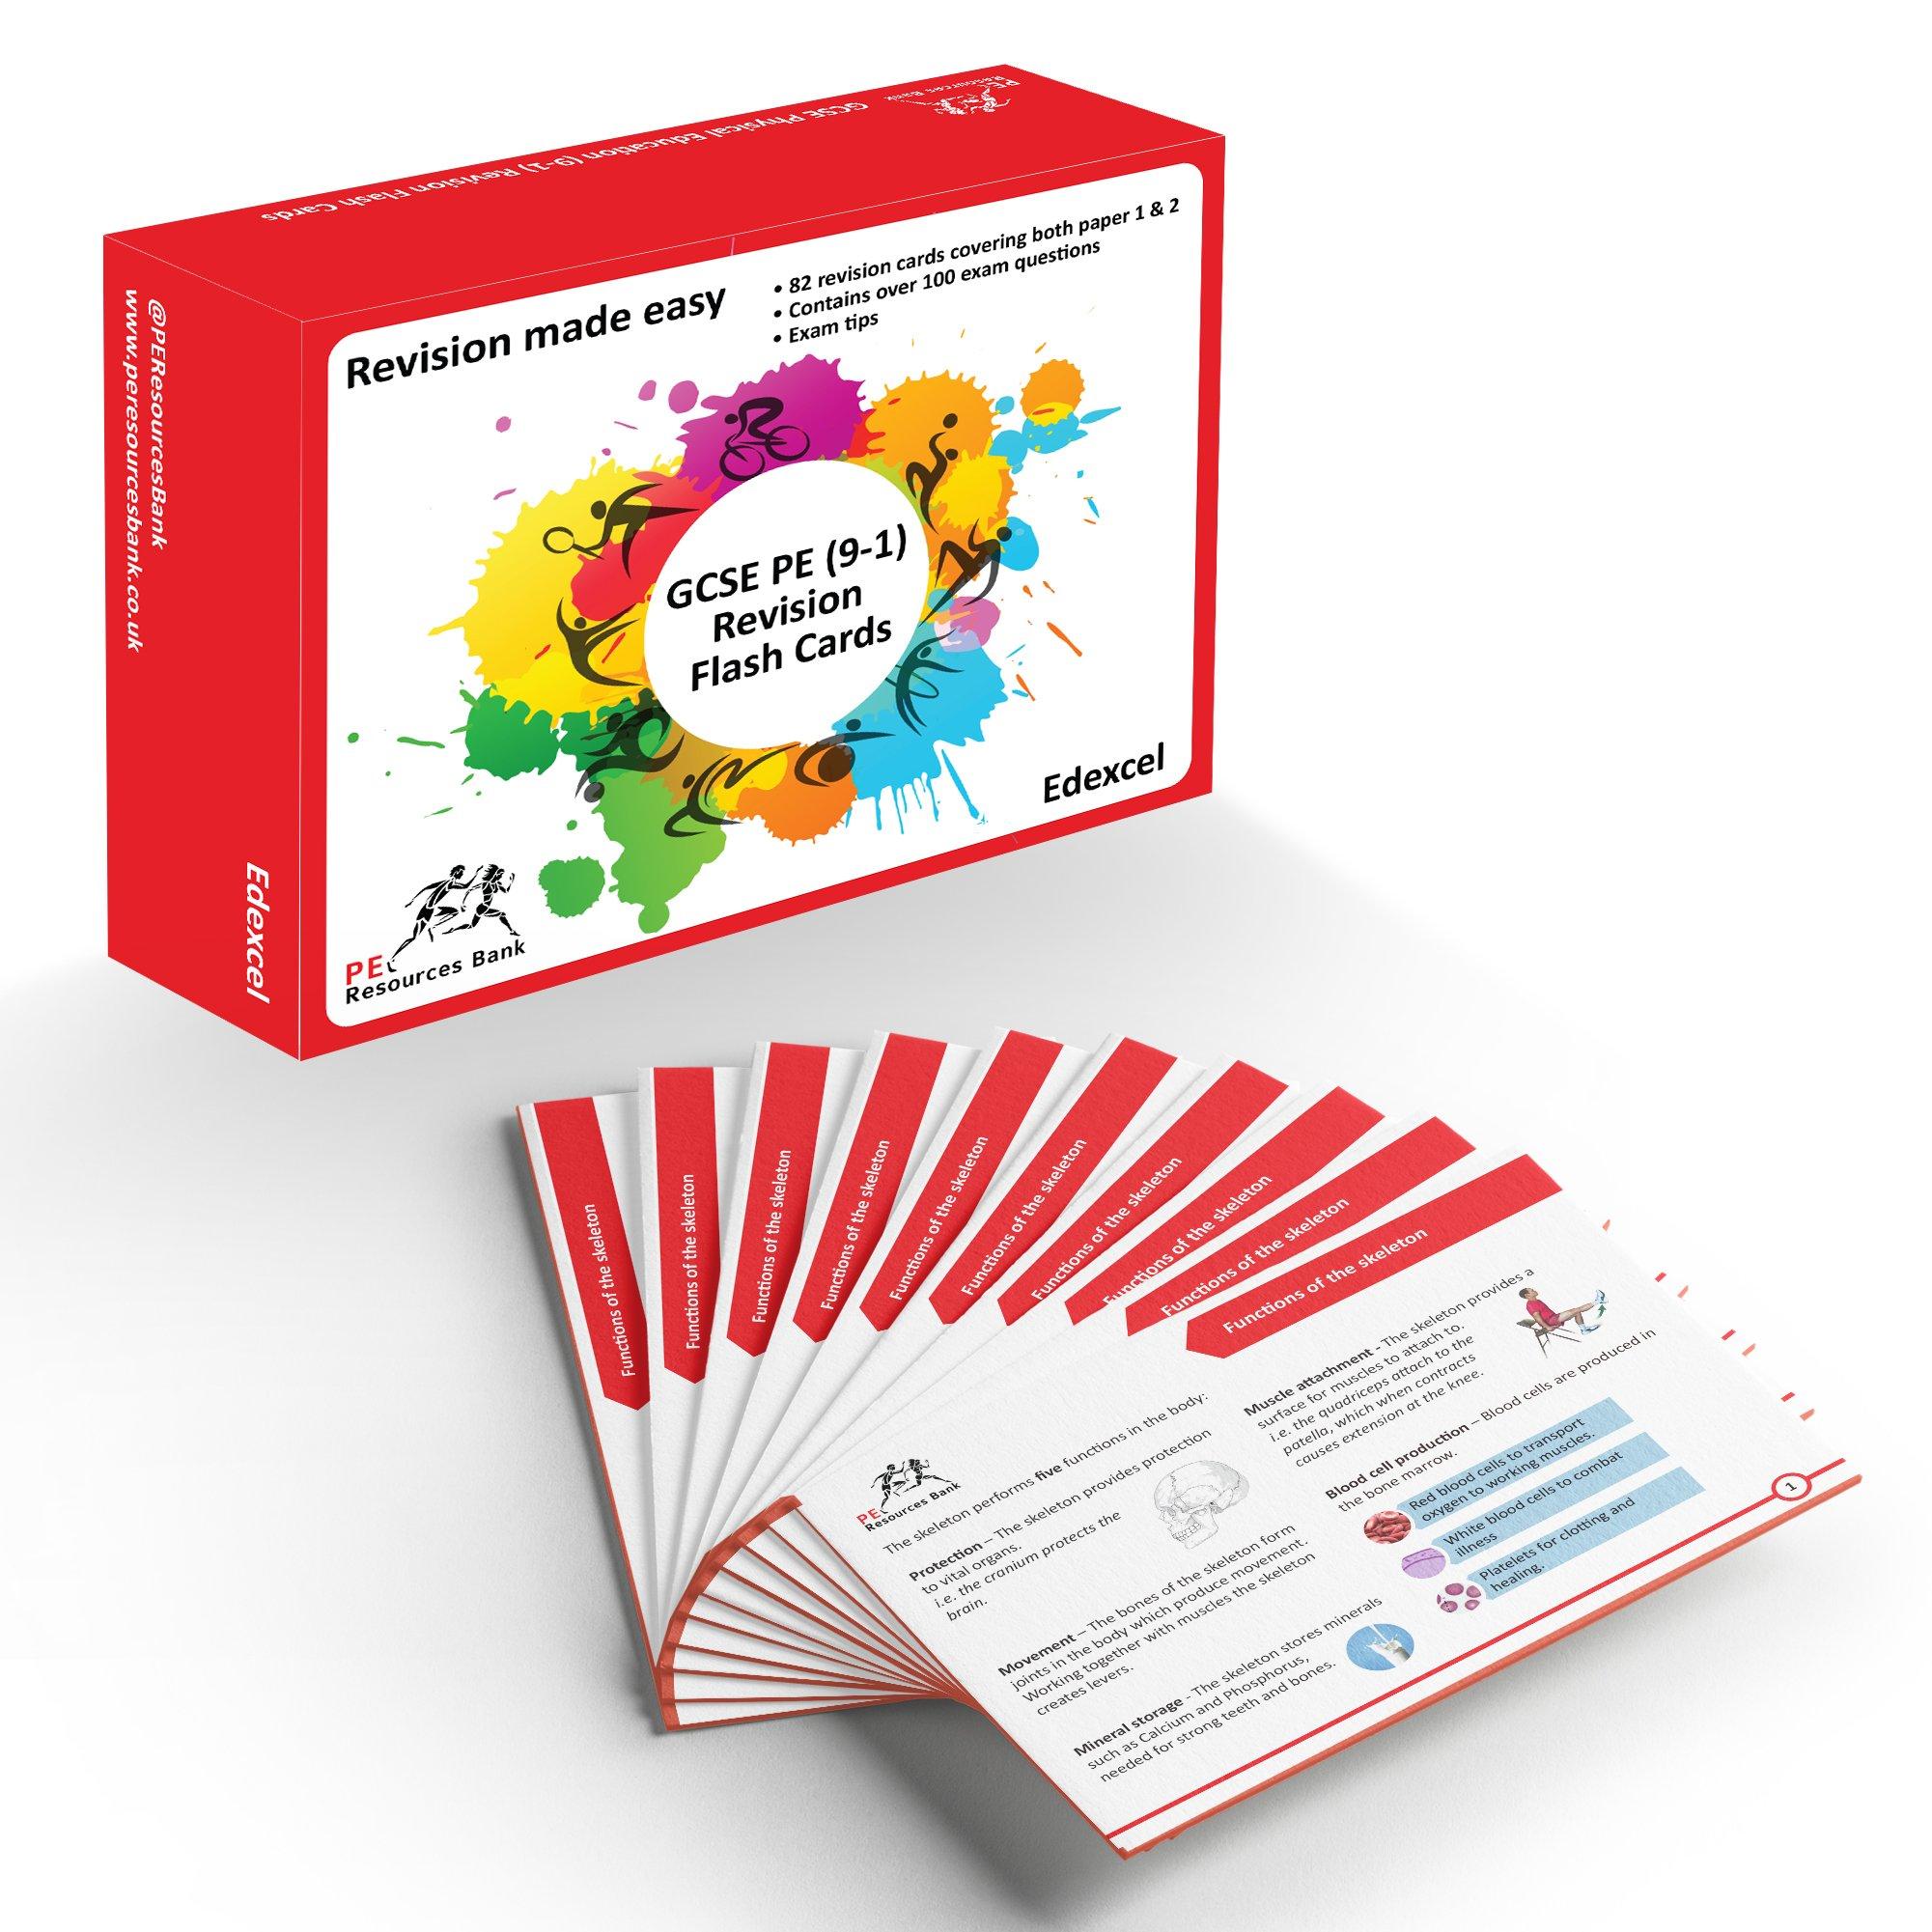 GCSE Physical Education (9-1) Revision Flash Cards: Amazon